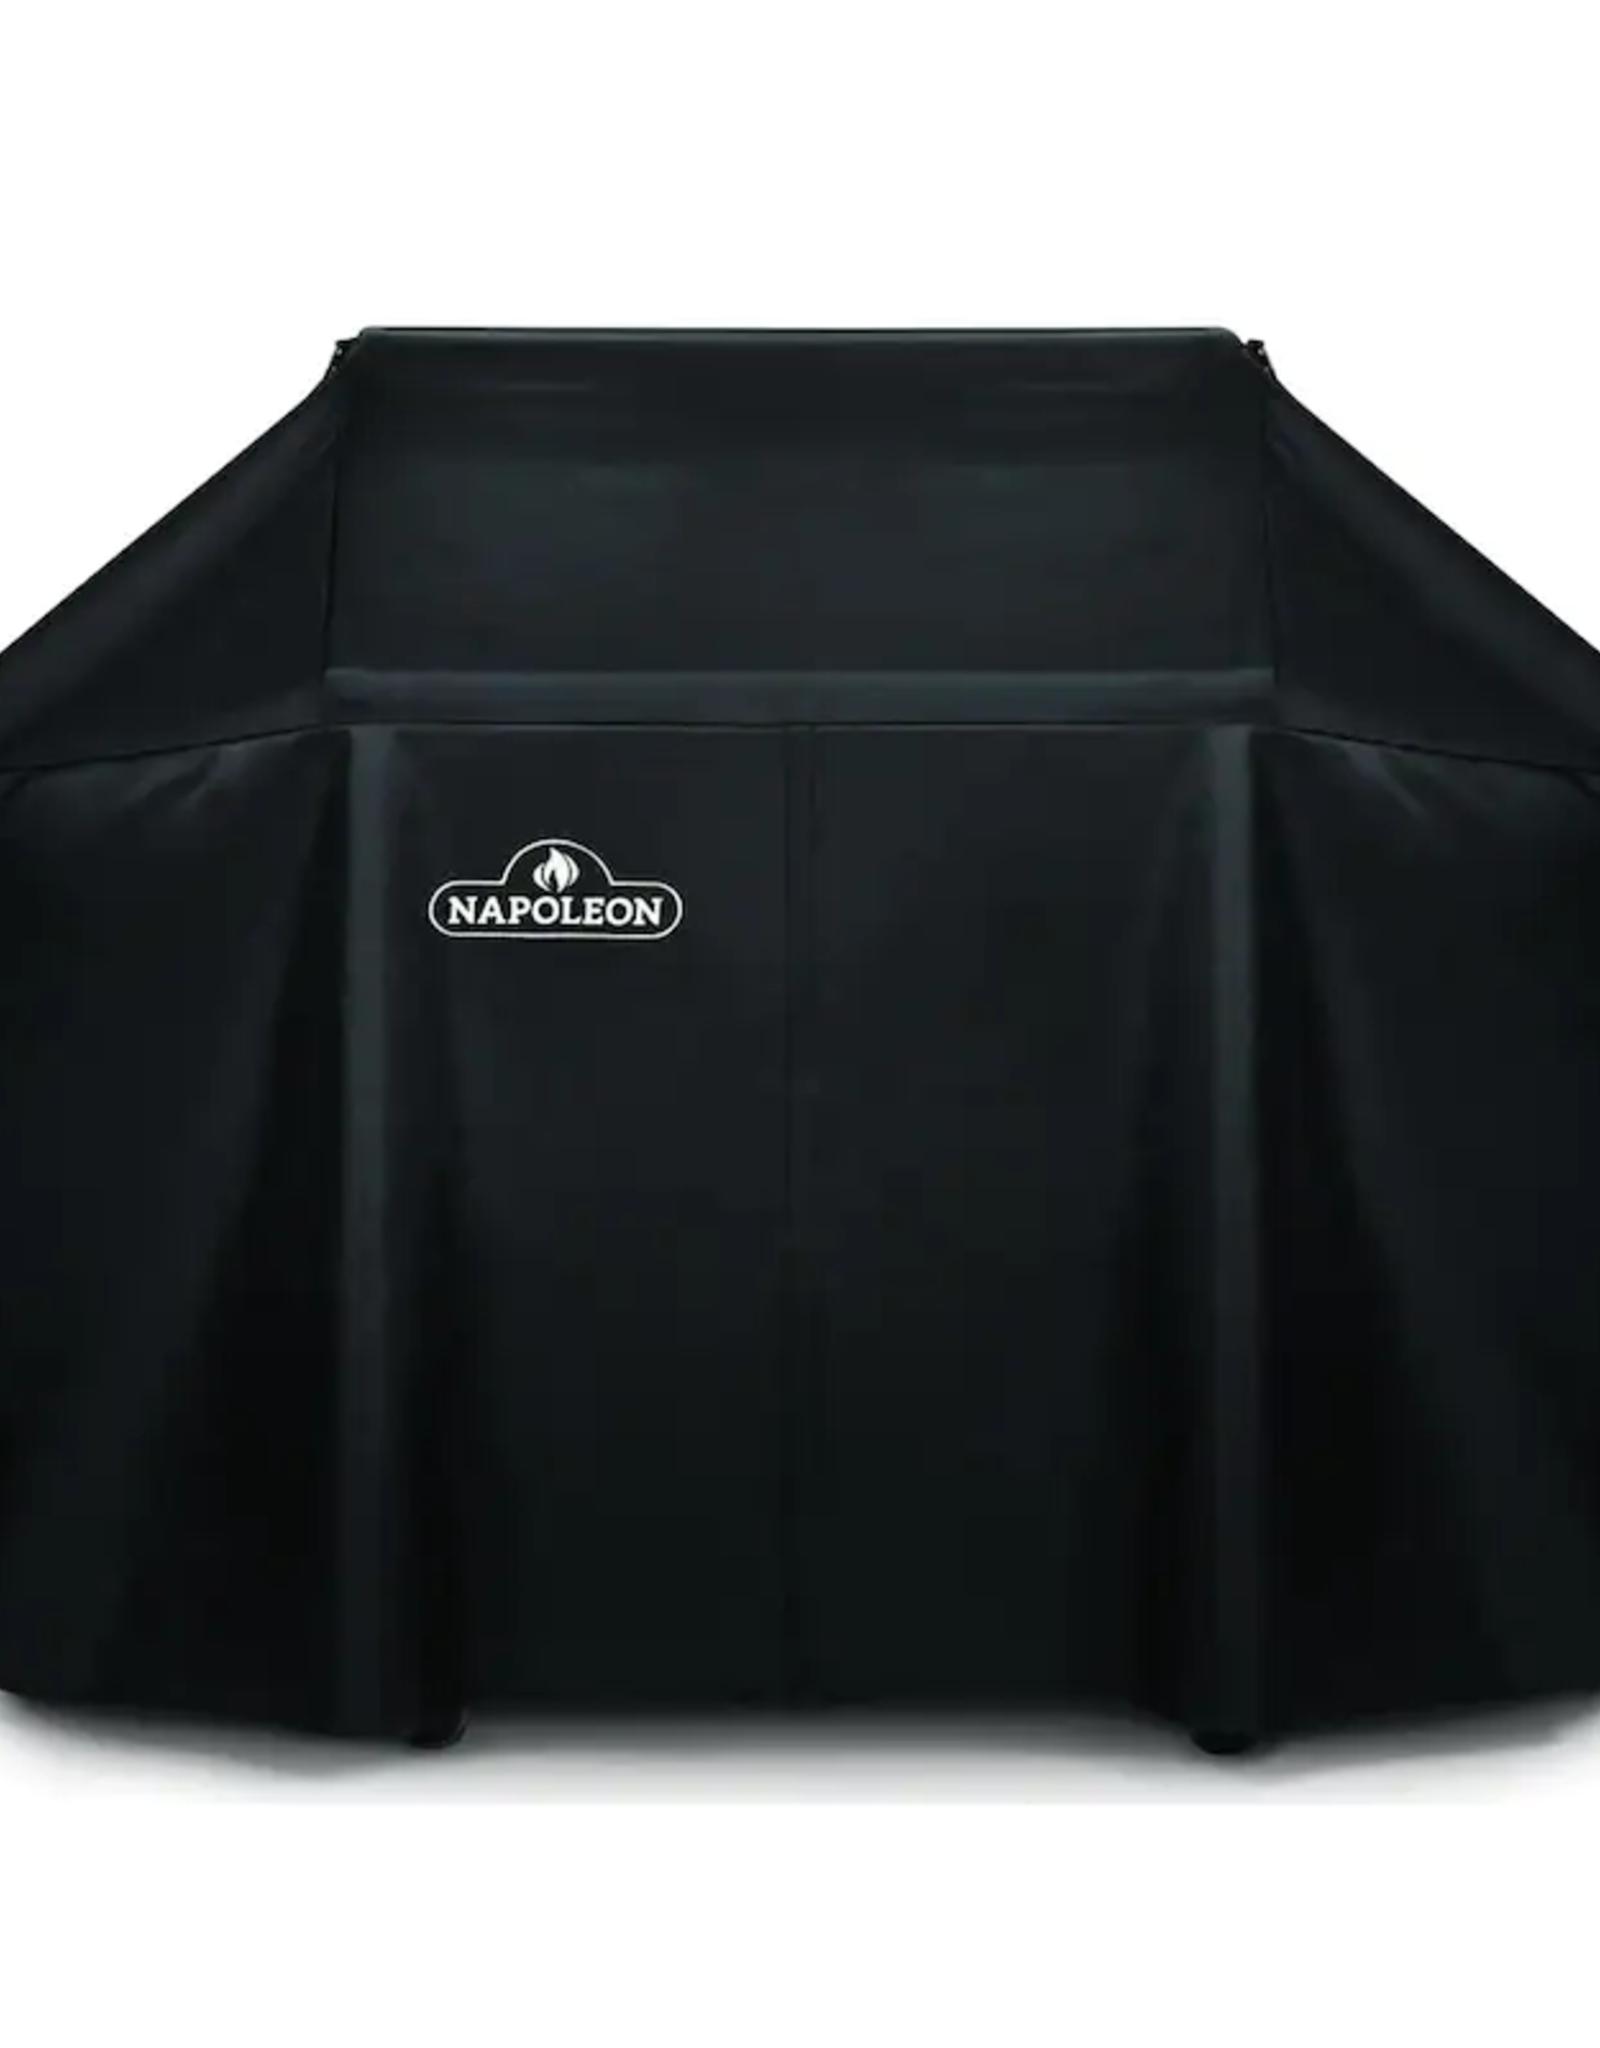 Napoleon Napoleon Grill Cover For PRO 500 & Prestige 500 Series Freestanding Gas Grills - 61500